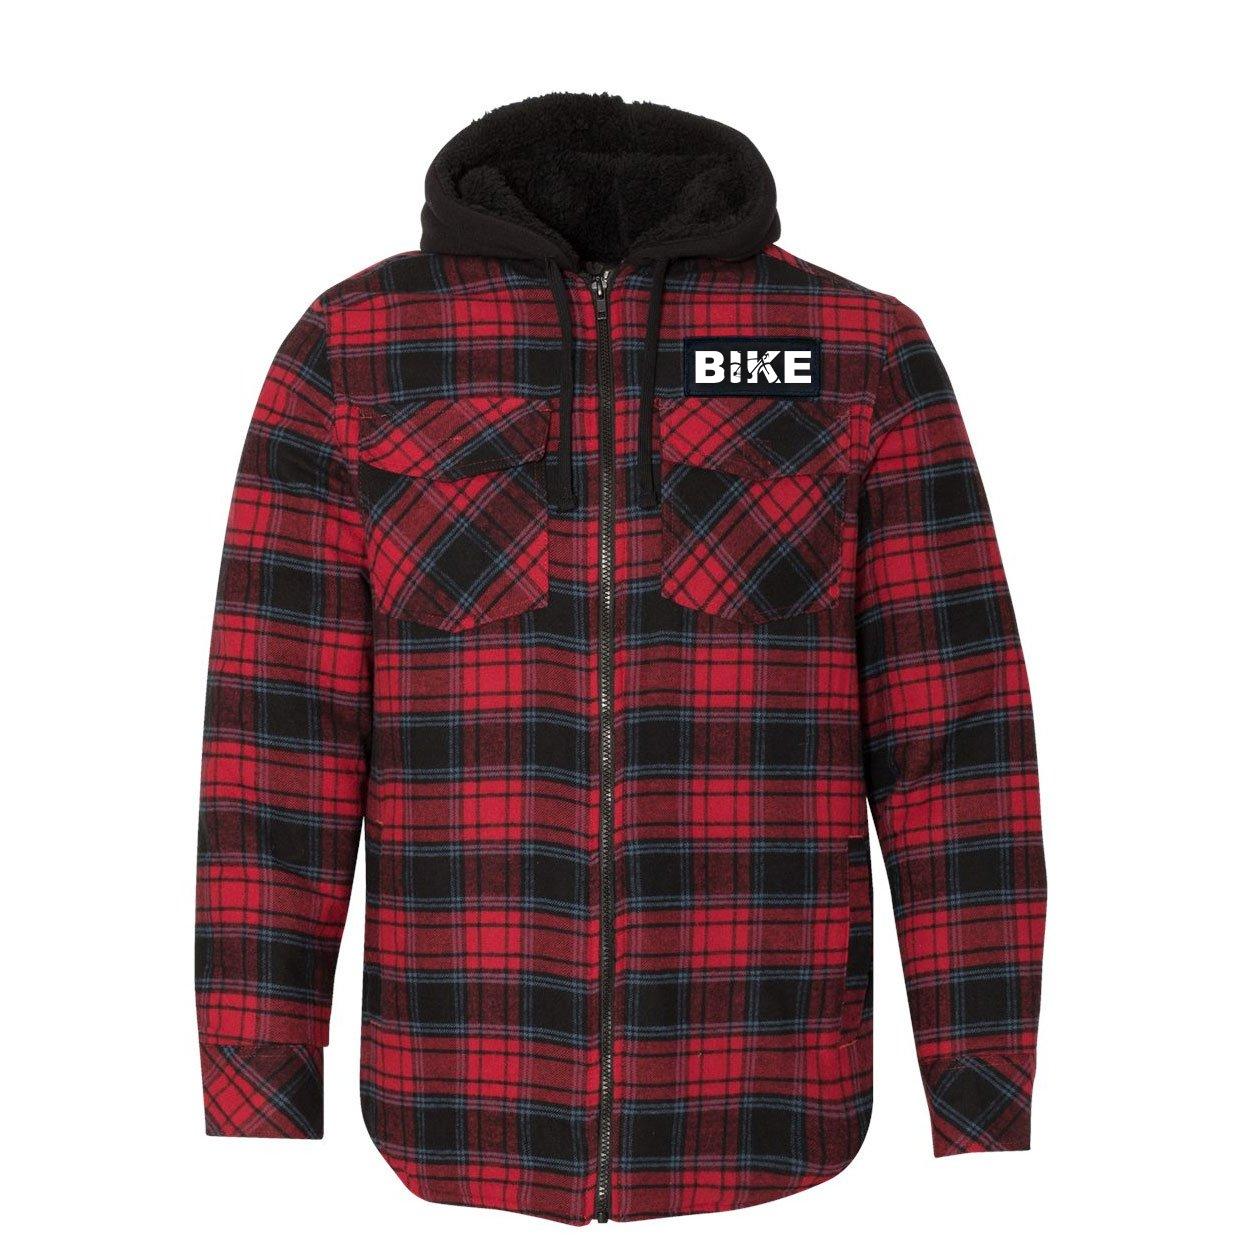 Bike Cycling Logo Classic Unisex Full Zip Woven Patch Hooded Flannel Jacket Red/Black Buffalo (White Logo)